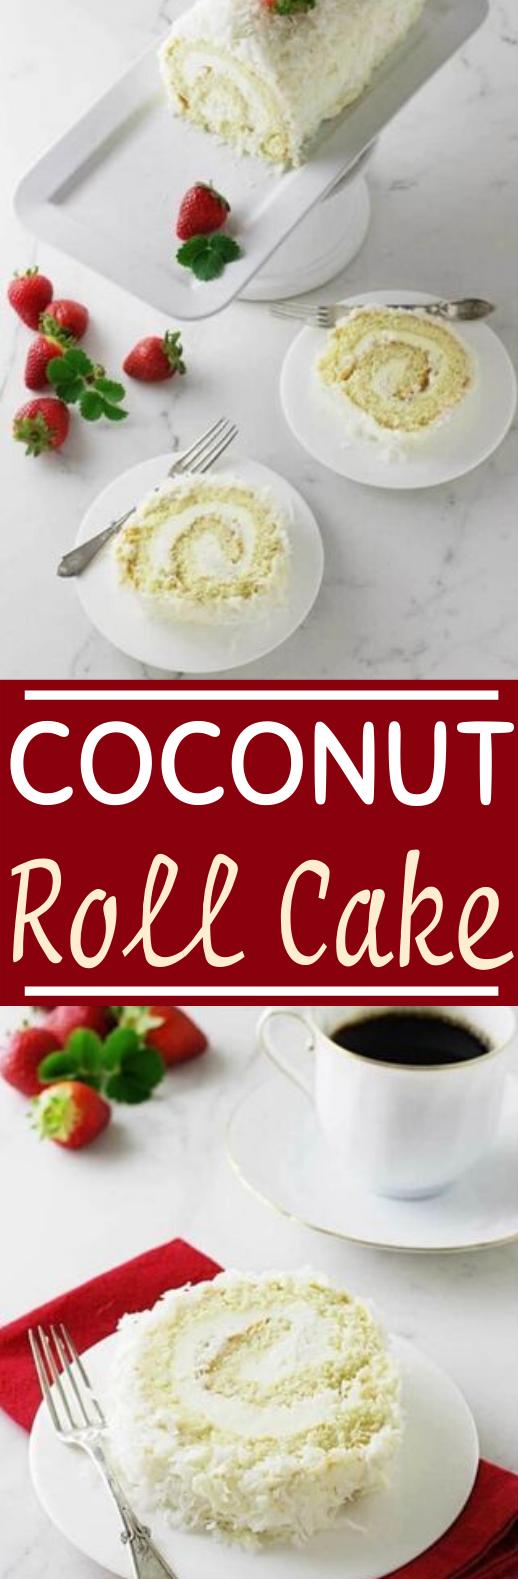 Coconut Cake Roll #cake #desserts #recipes #baking #rollcake